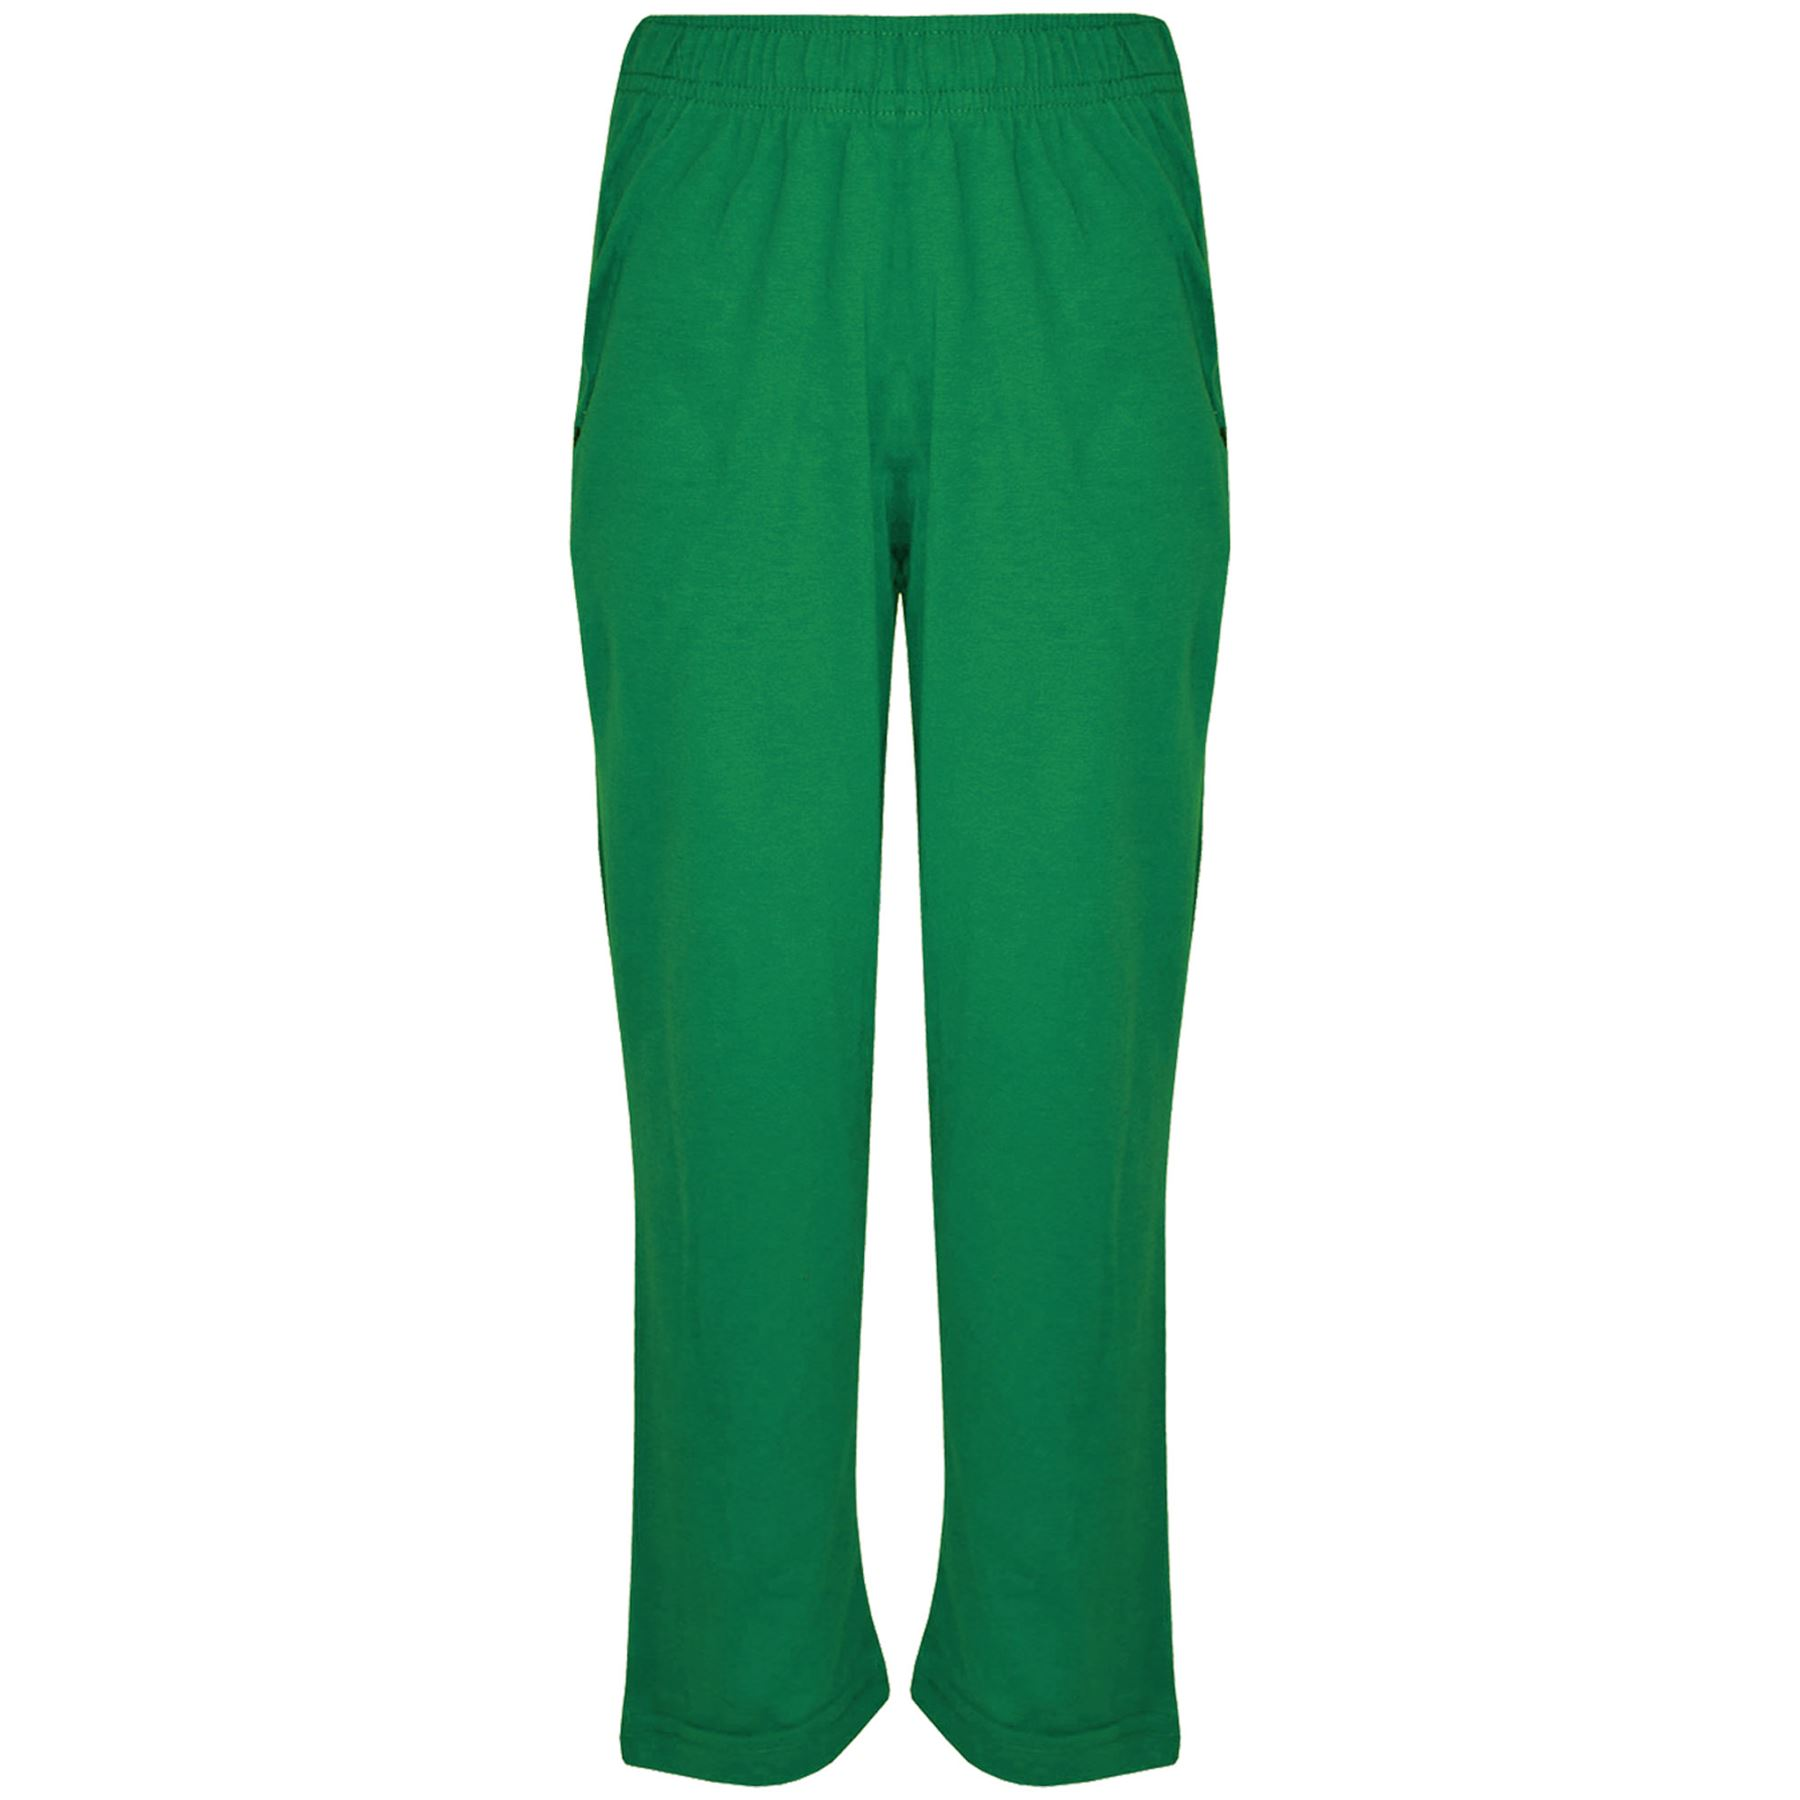 Kids Boys Girls PJS Designer Ya Filthy Animal Green Christmas Pyjamas 2-13 Years